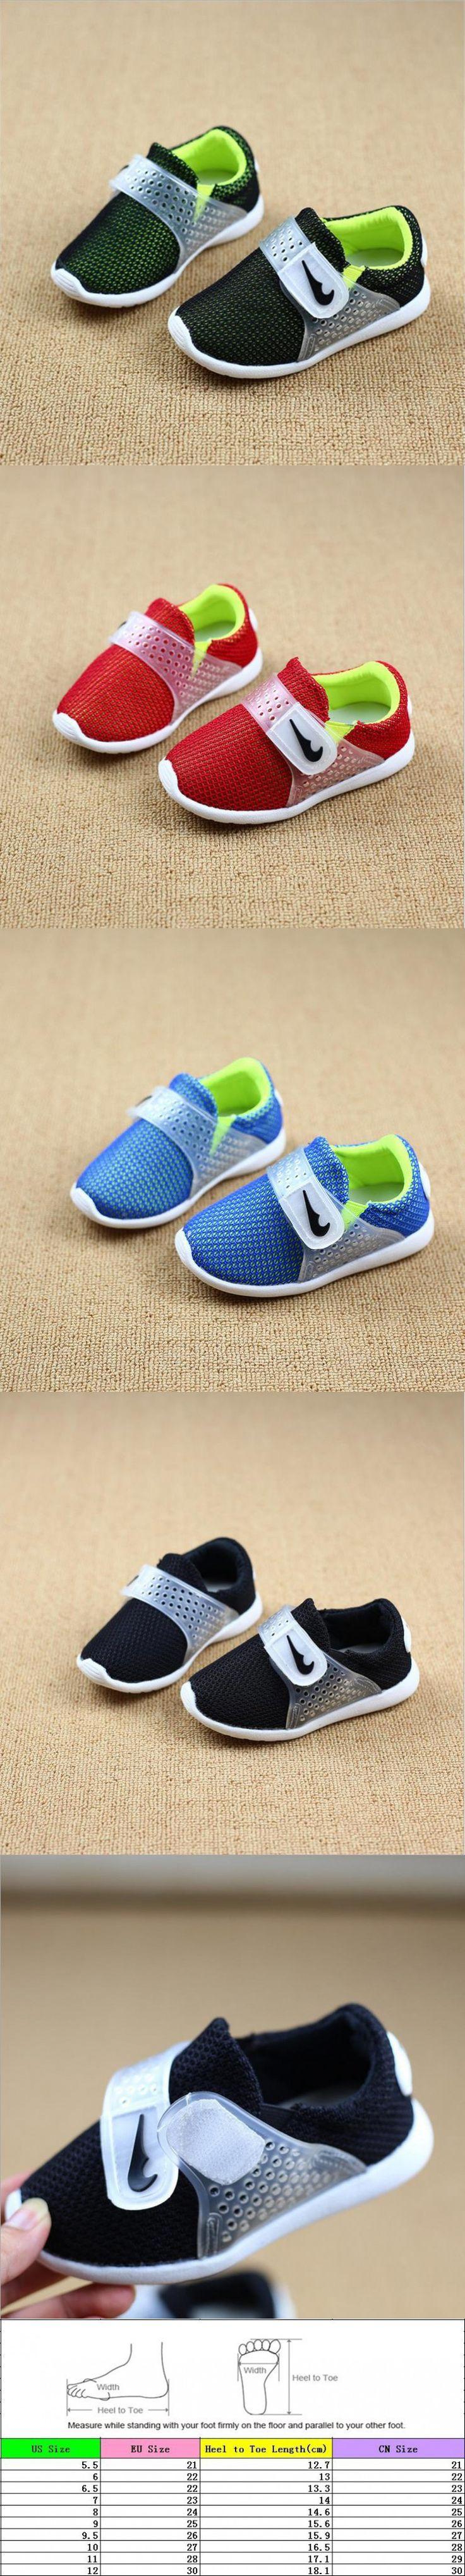 2016 Spring/autumn New casual Kids shoes, chaussure enfant breathable Mesh Fashion sneakers Children shoes/Sapato infantil